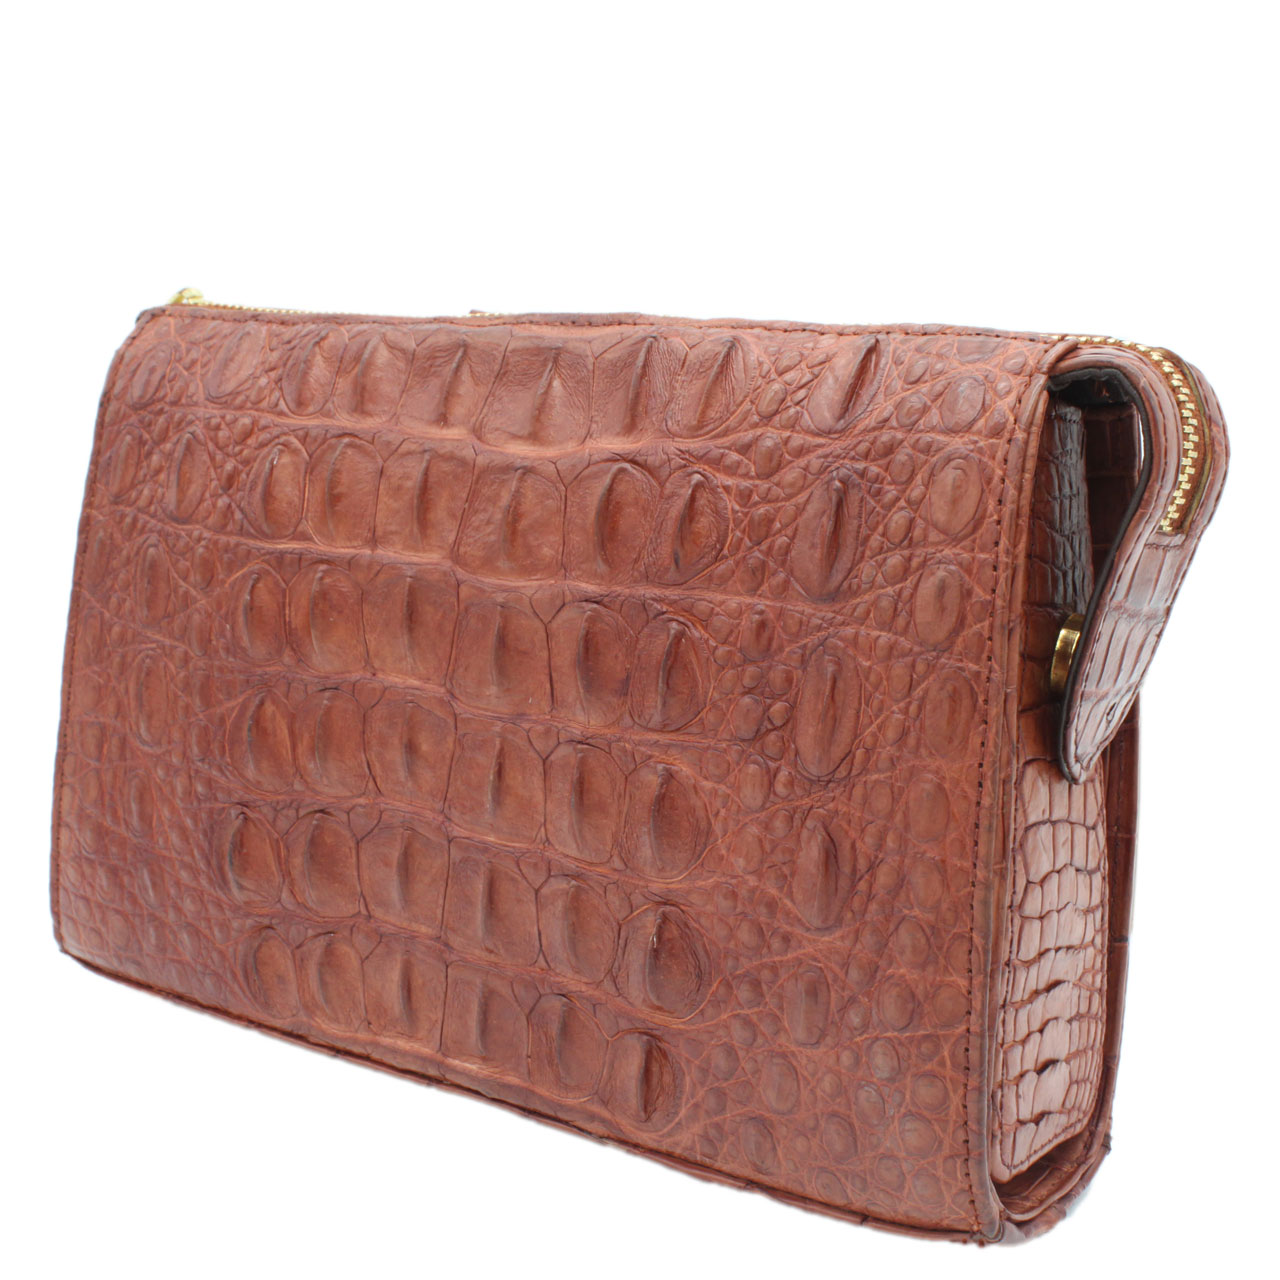 Crocodile Leather Purse S340a